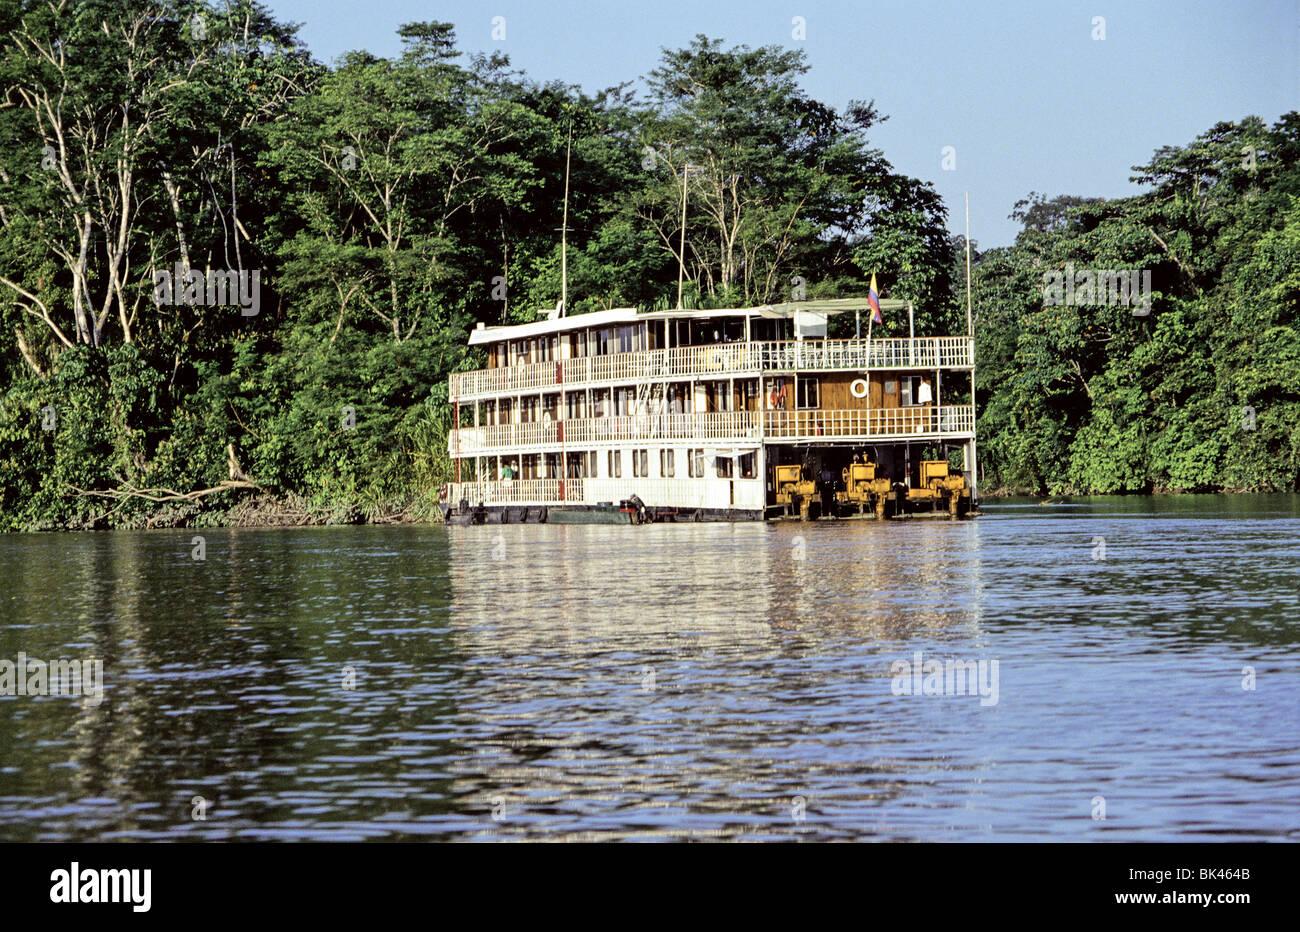 Three-deck riverboat the Flotel Francisco de Orellana on a river in the Amazon Region of Ecuador - Stock Image